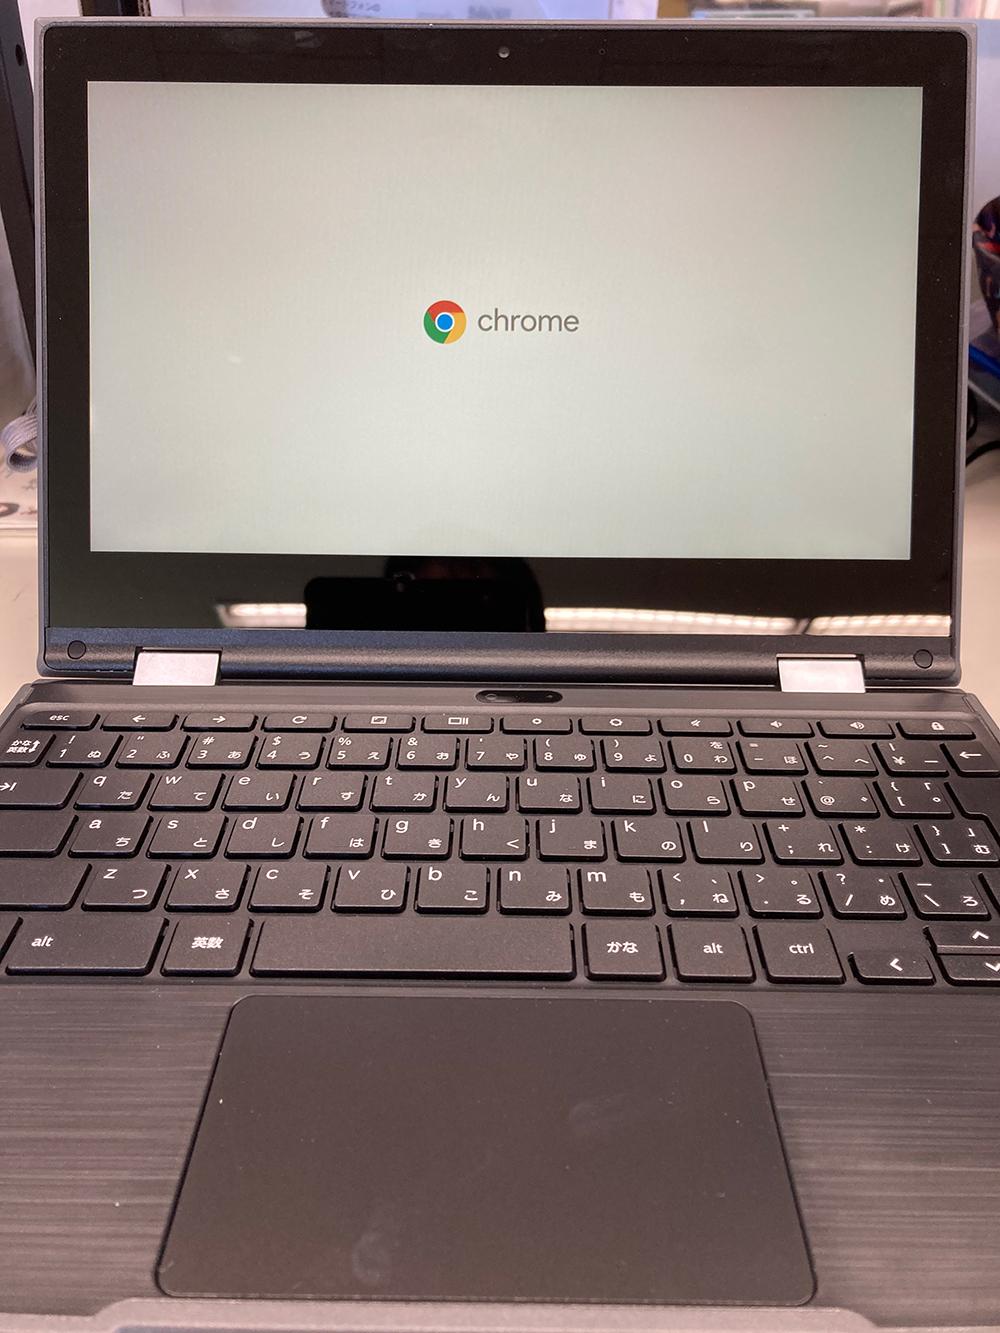 The Chromebooks